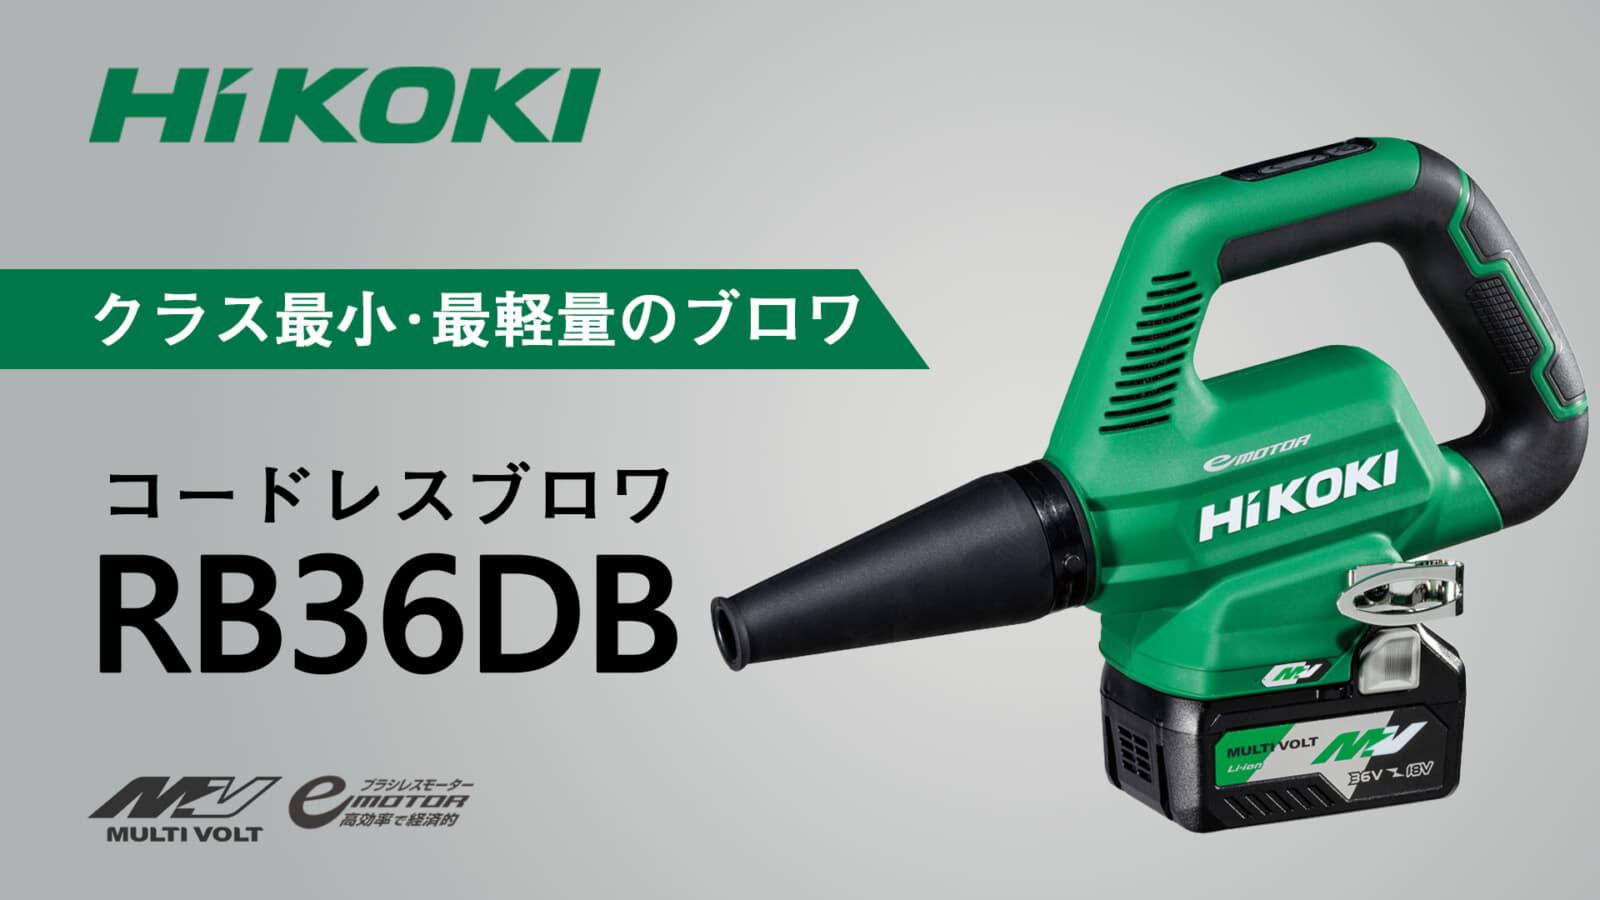 HiKOKI RB36DB コードレスブロワ発売、業界最小のコンパクトブロワ